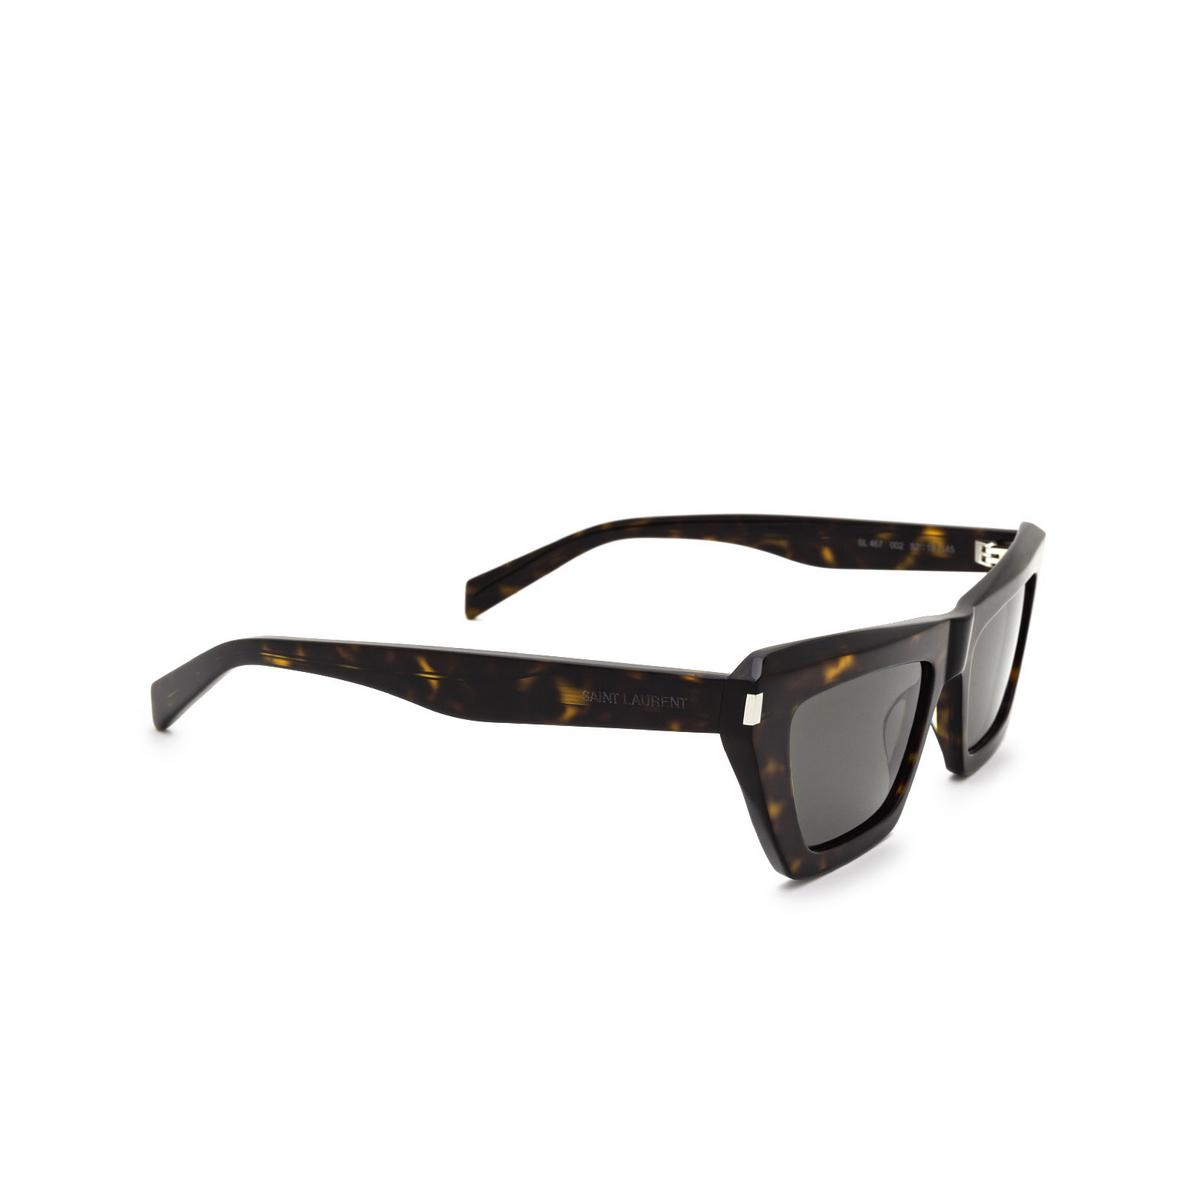 Saint Laurent® Cat-eye Sunglasses: SL 467 color Dark Havana 002 - three-quarters view.